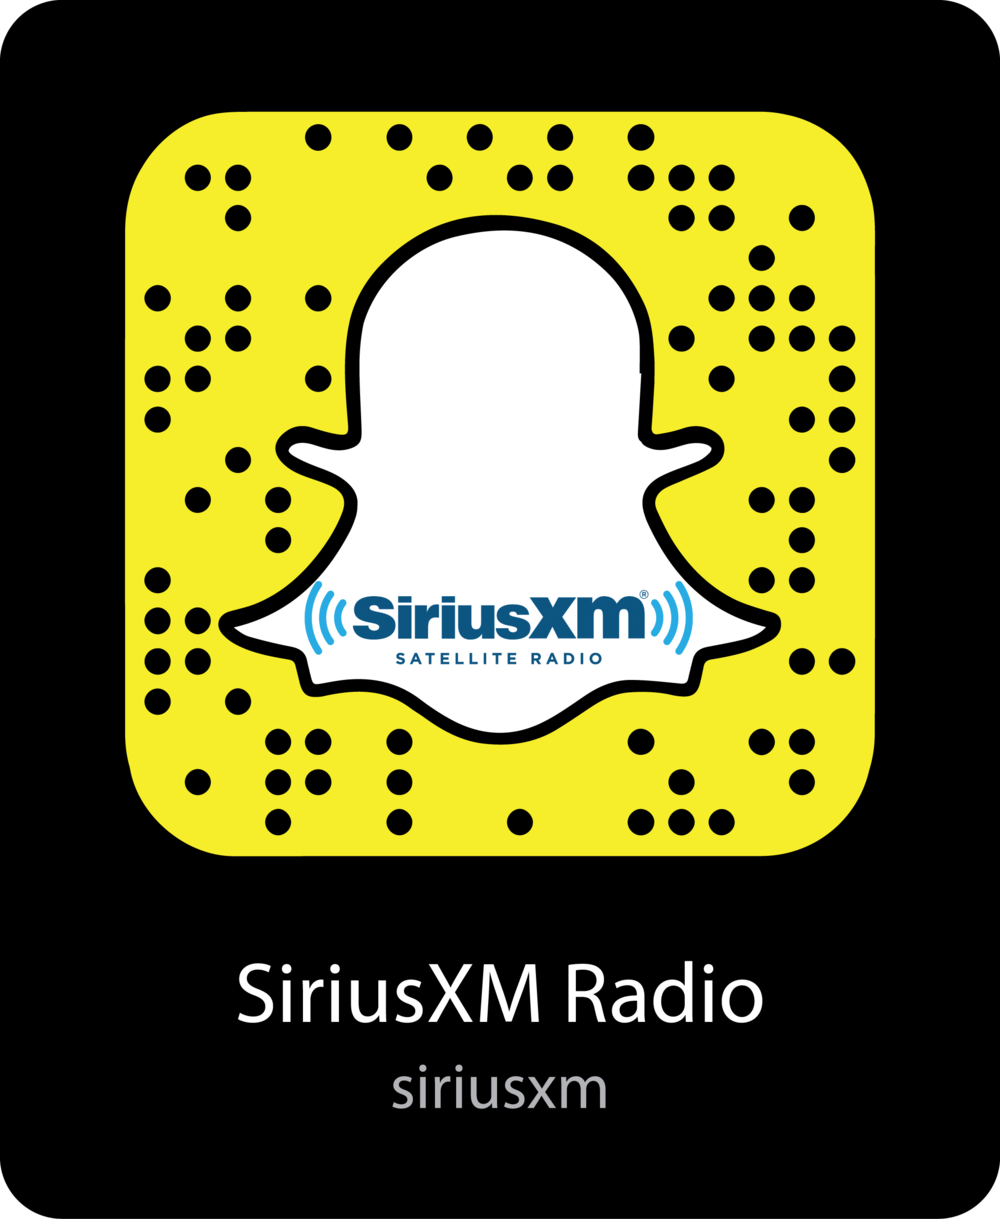 siriusxm-Brands-snapchat-snapcode.png